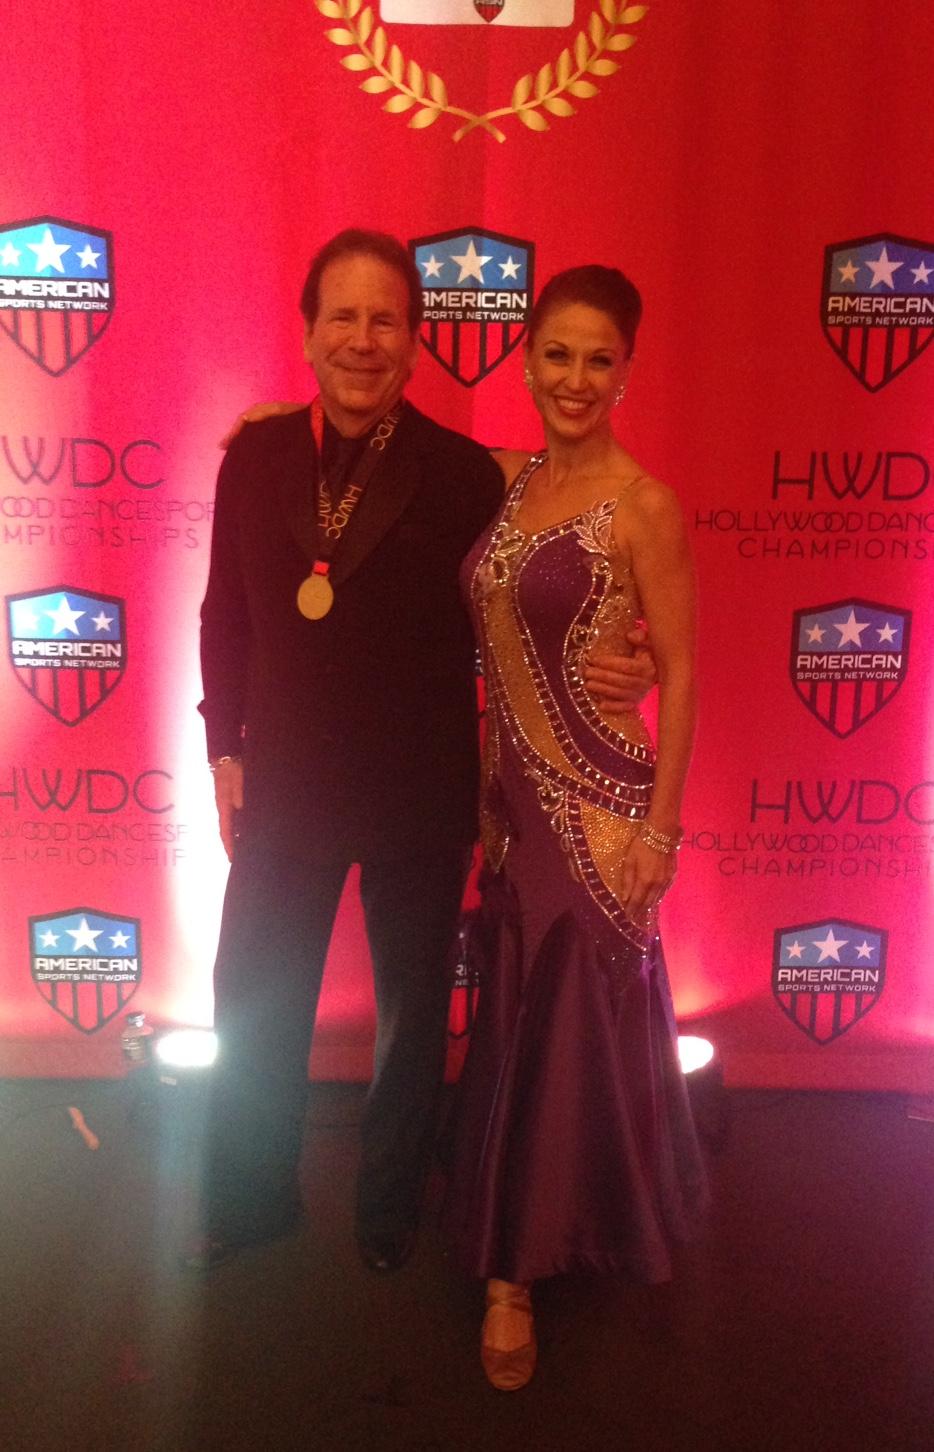 Hollywood Dancesport Championships '15